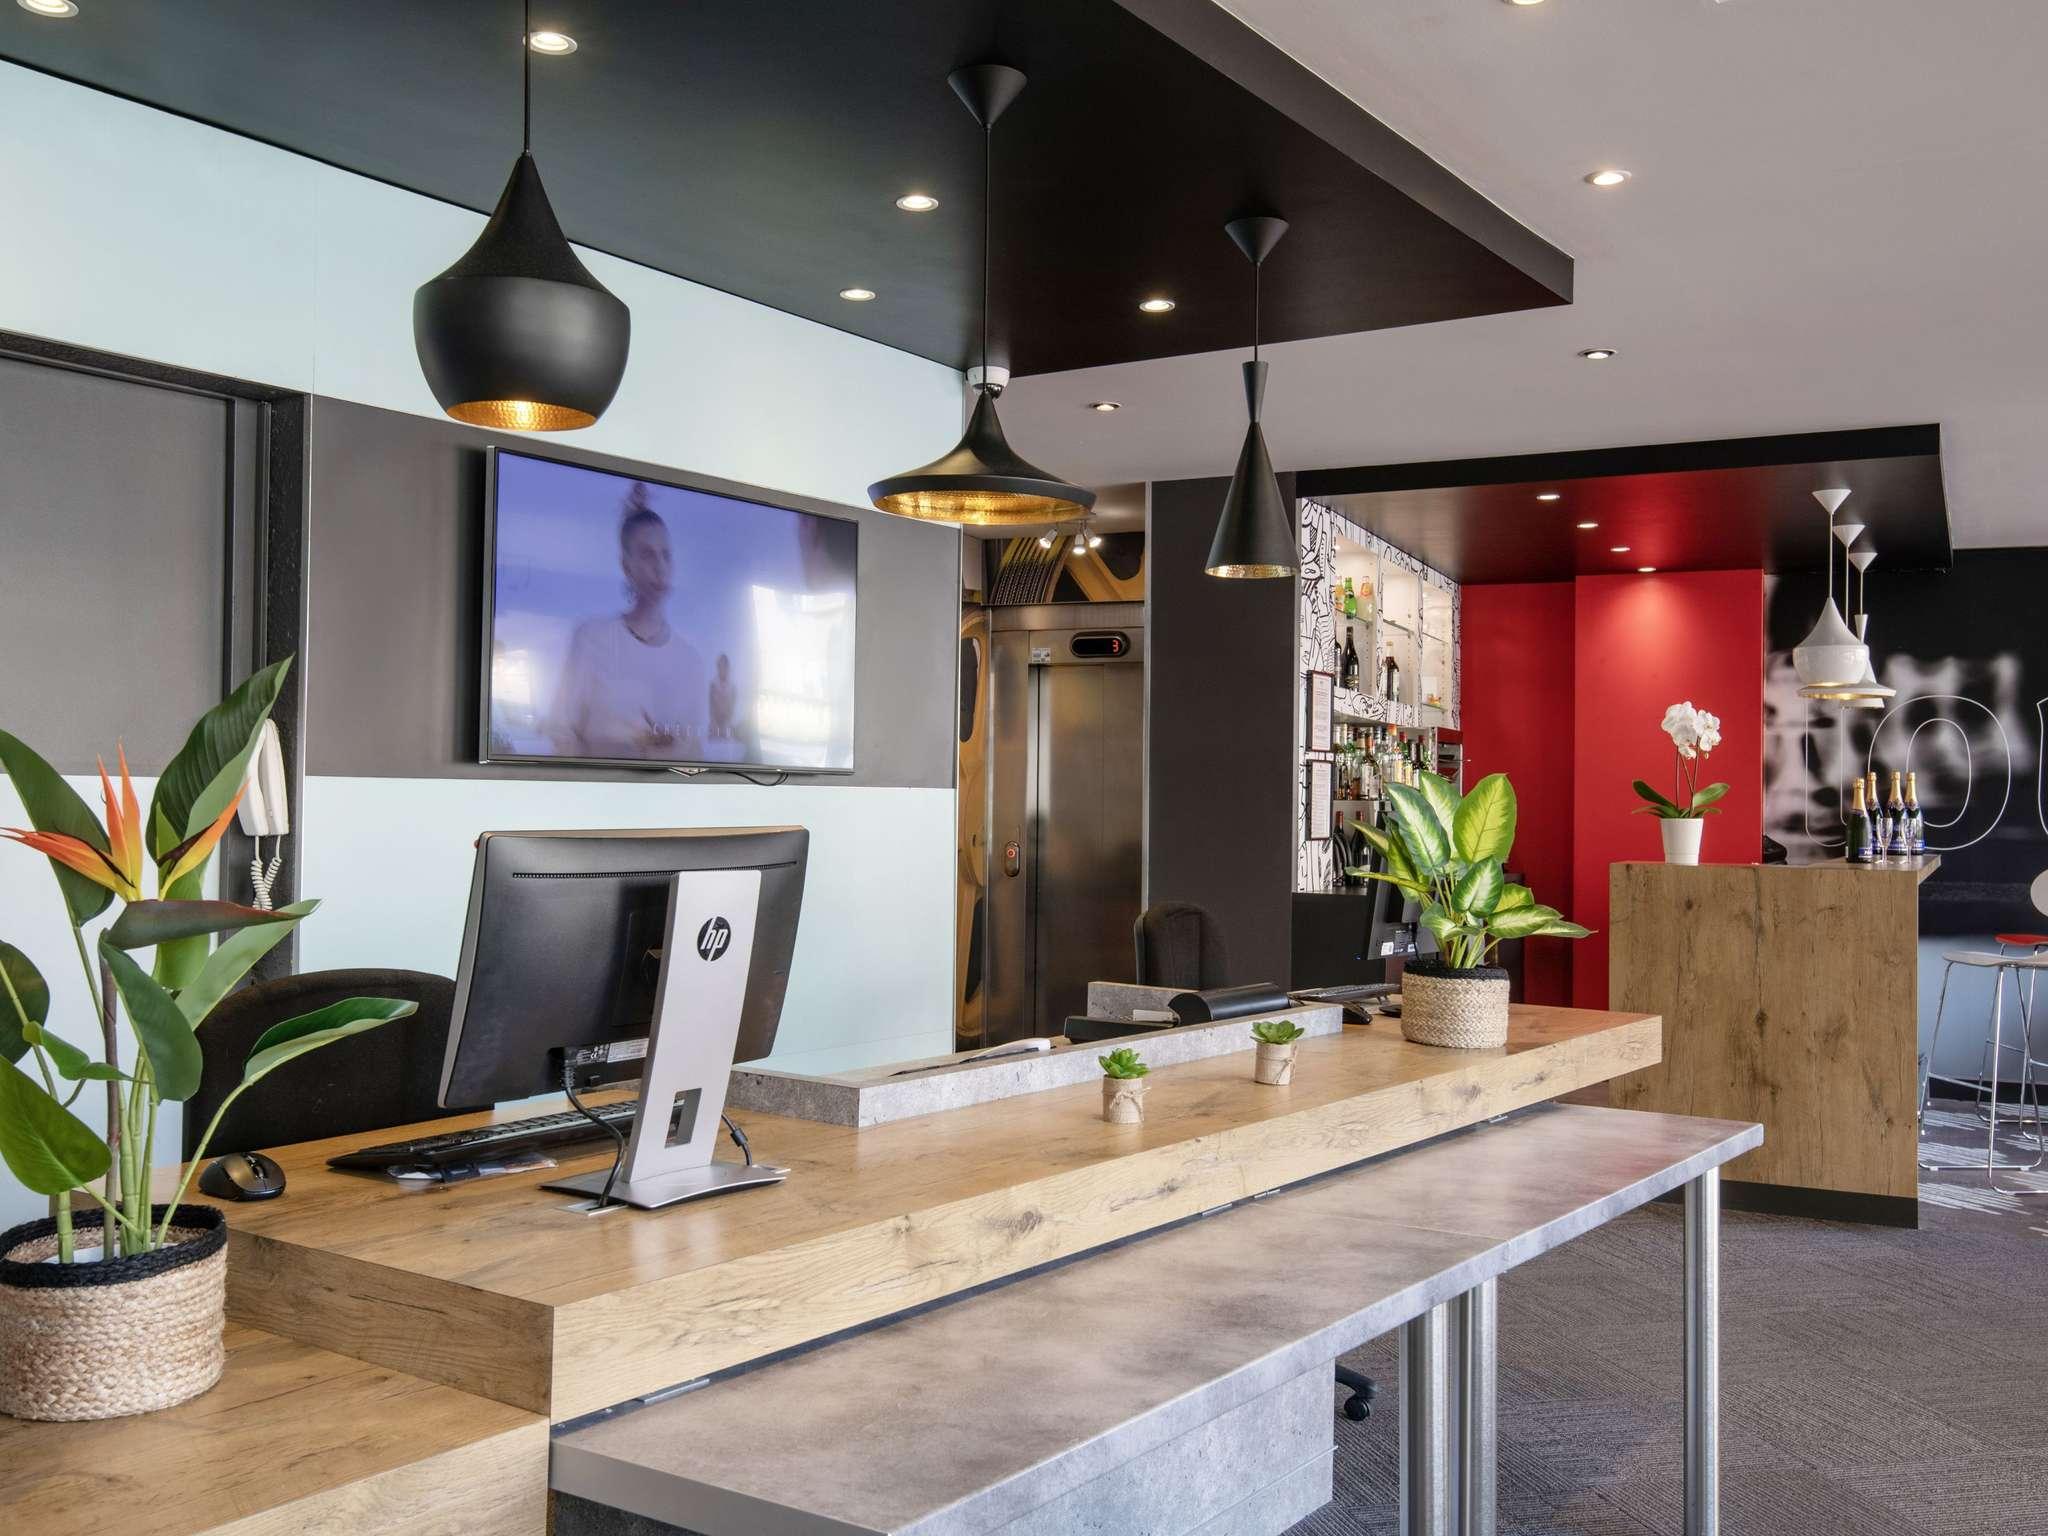 hotel in cannes ibis cannes plage la bocca. Black Bedroom Furniture Sets. Home Design Ideas